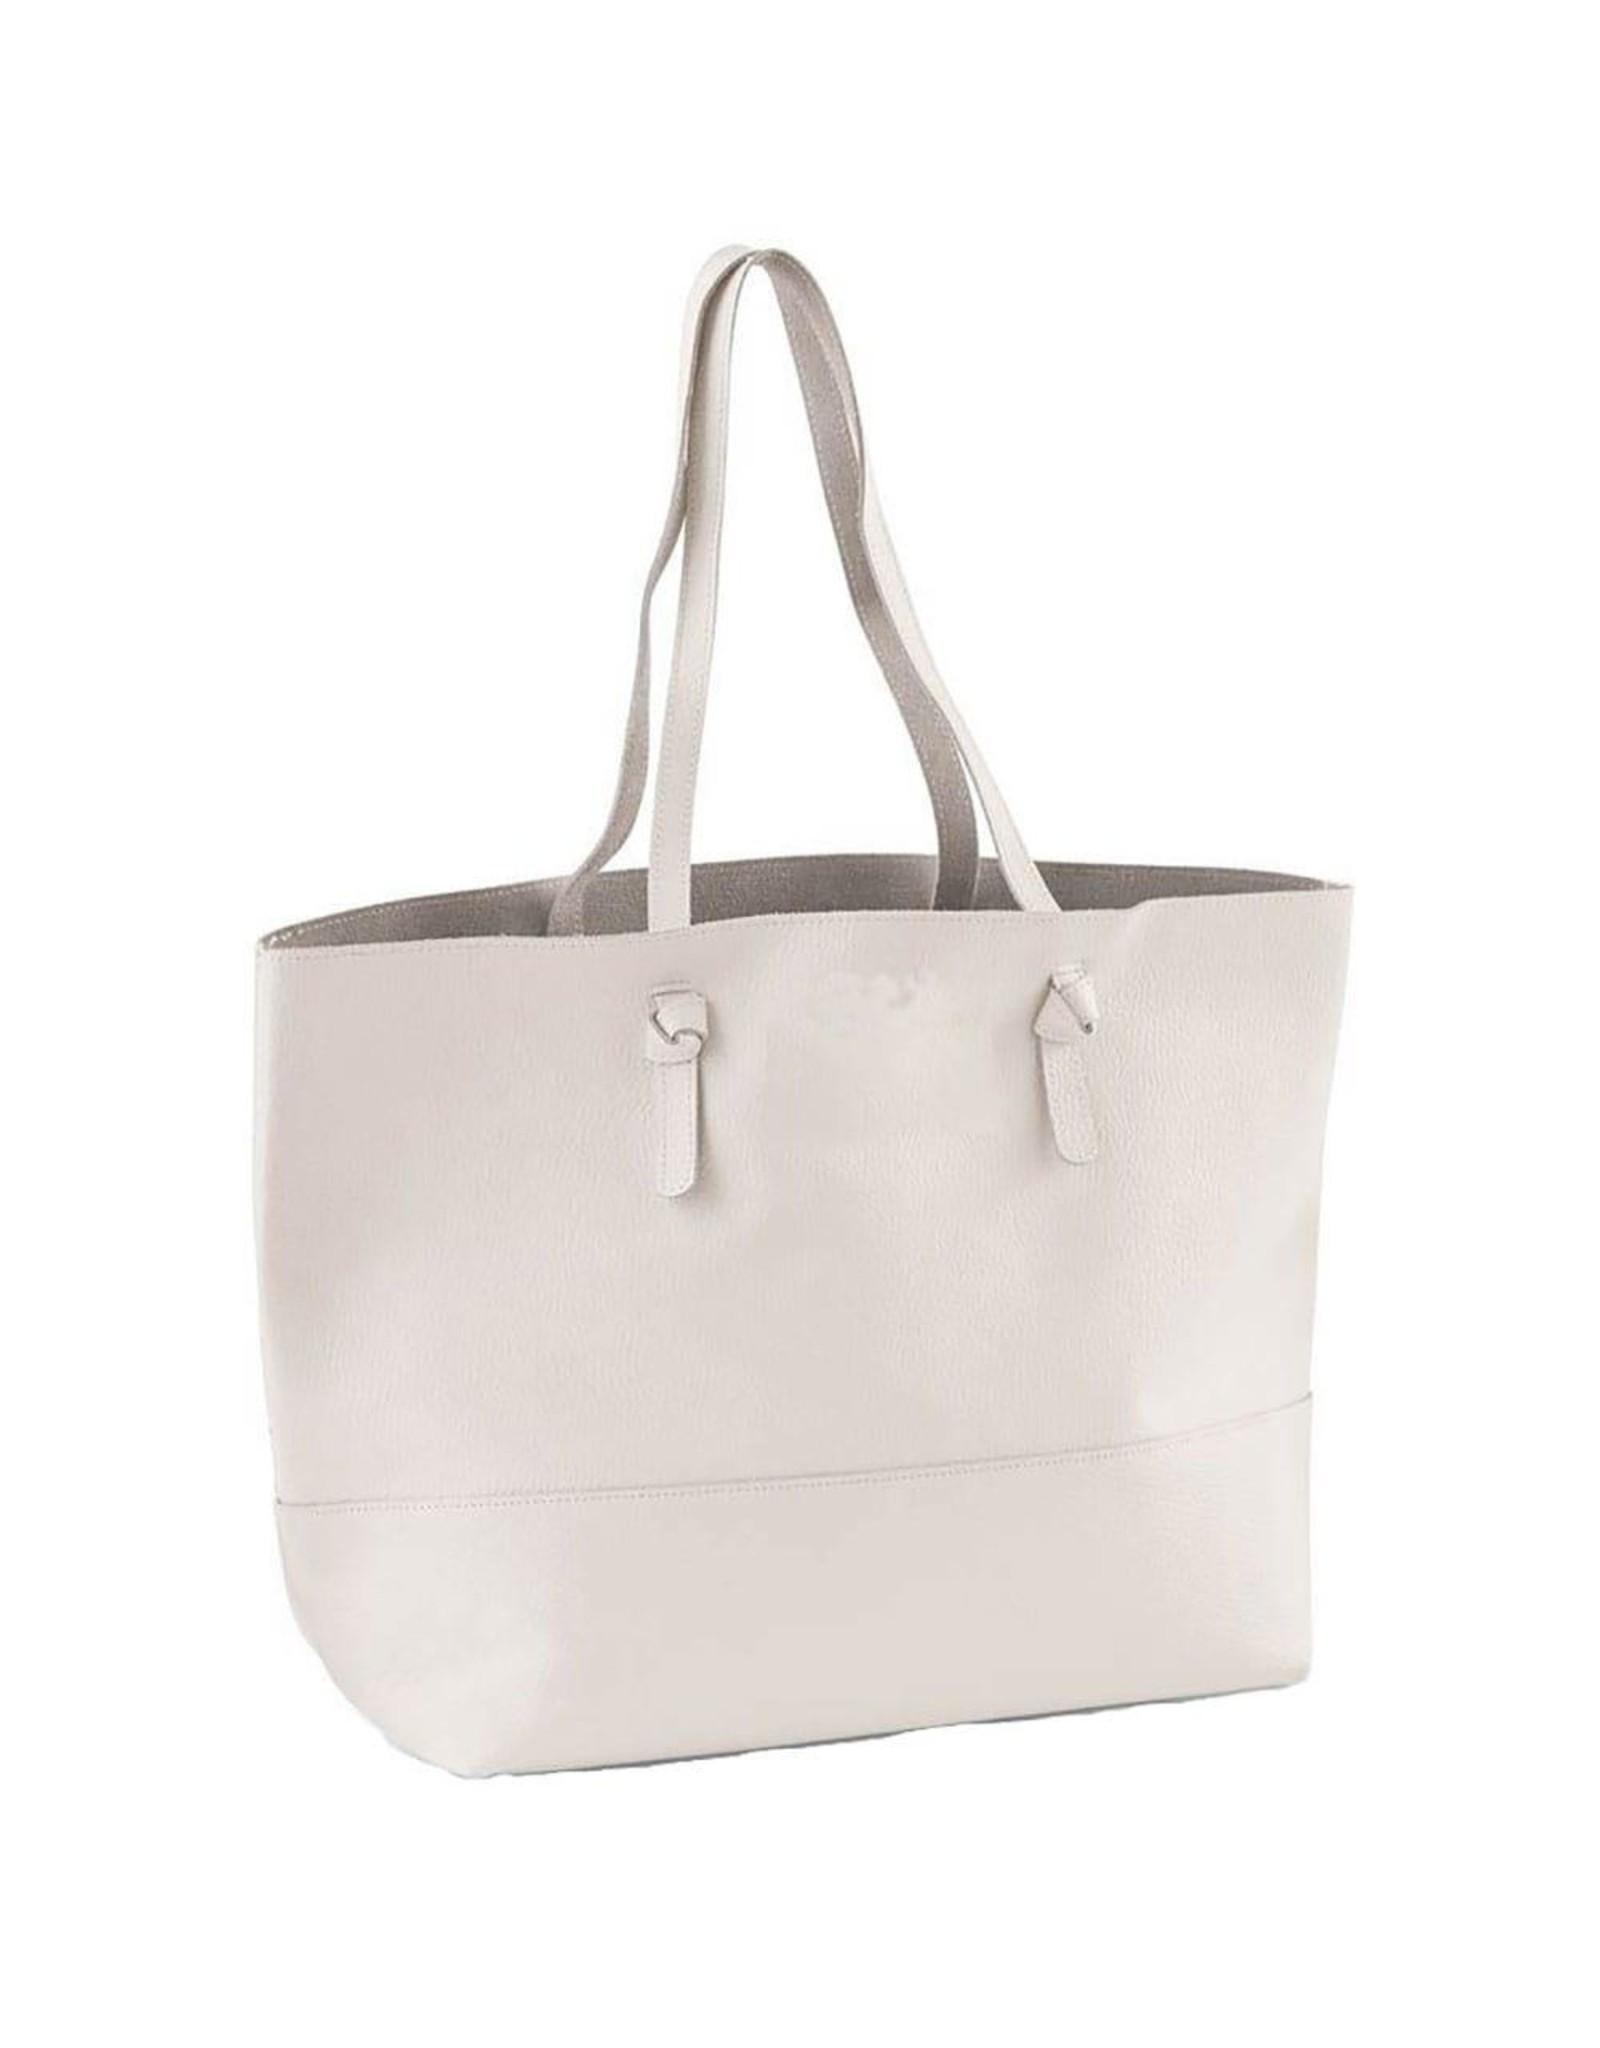 White Leather Perfect Tote